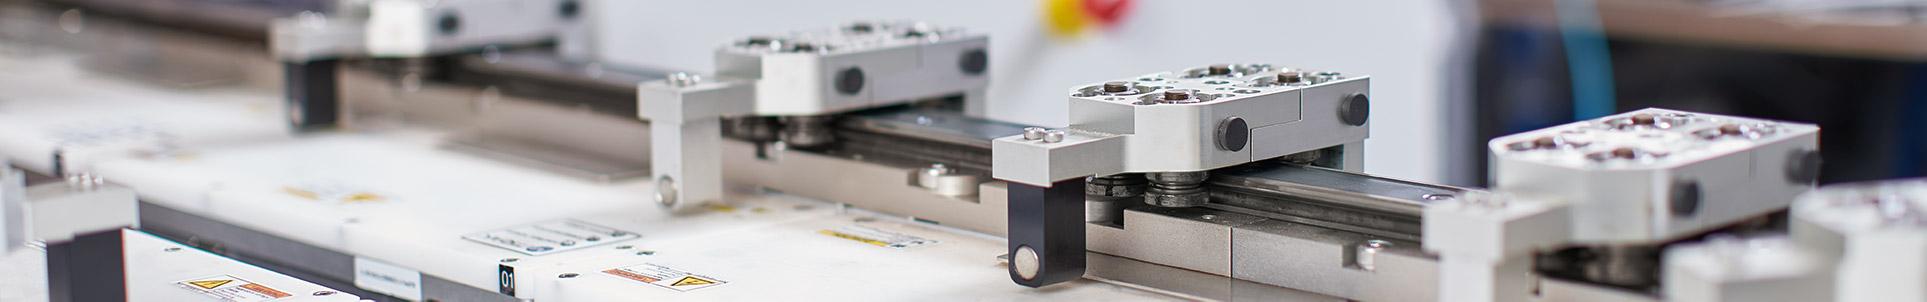 NemaSystems Automation Solutions